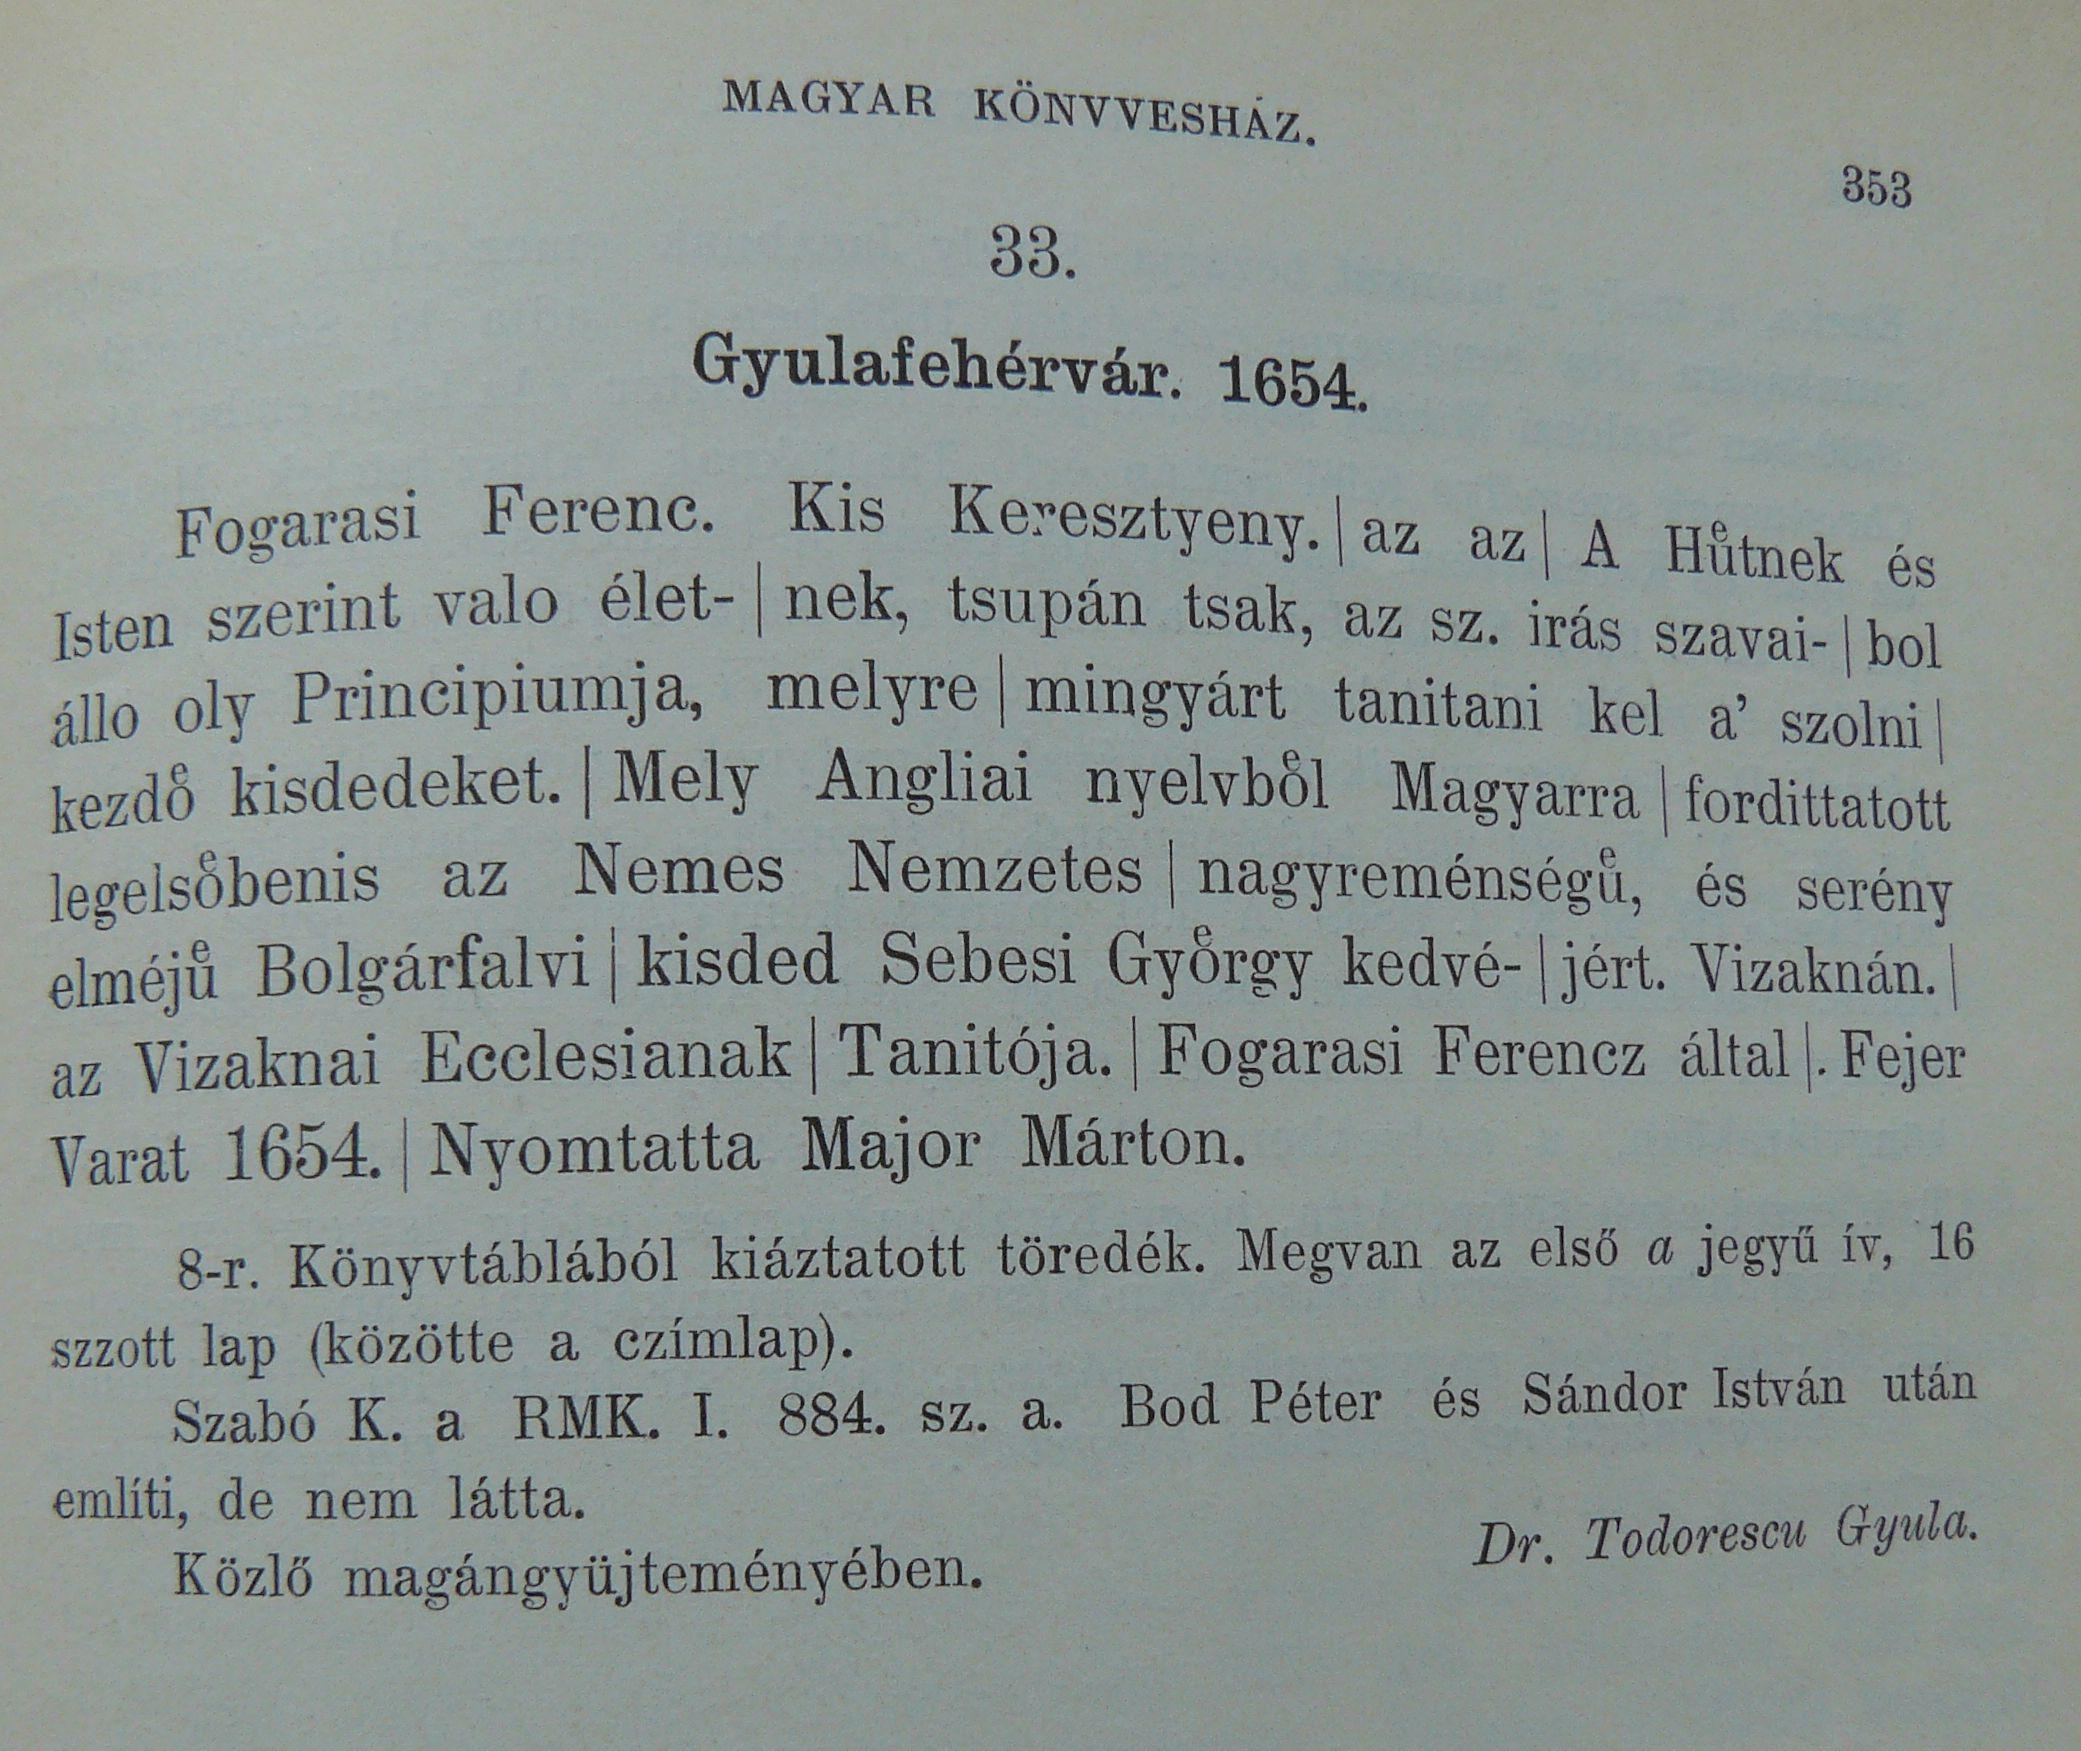 todoreszku_magyar_konyvszemle.jpg